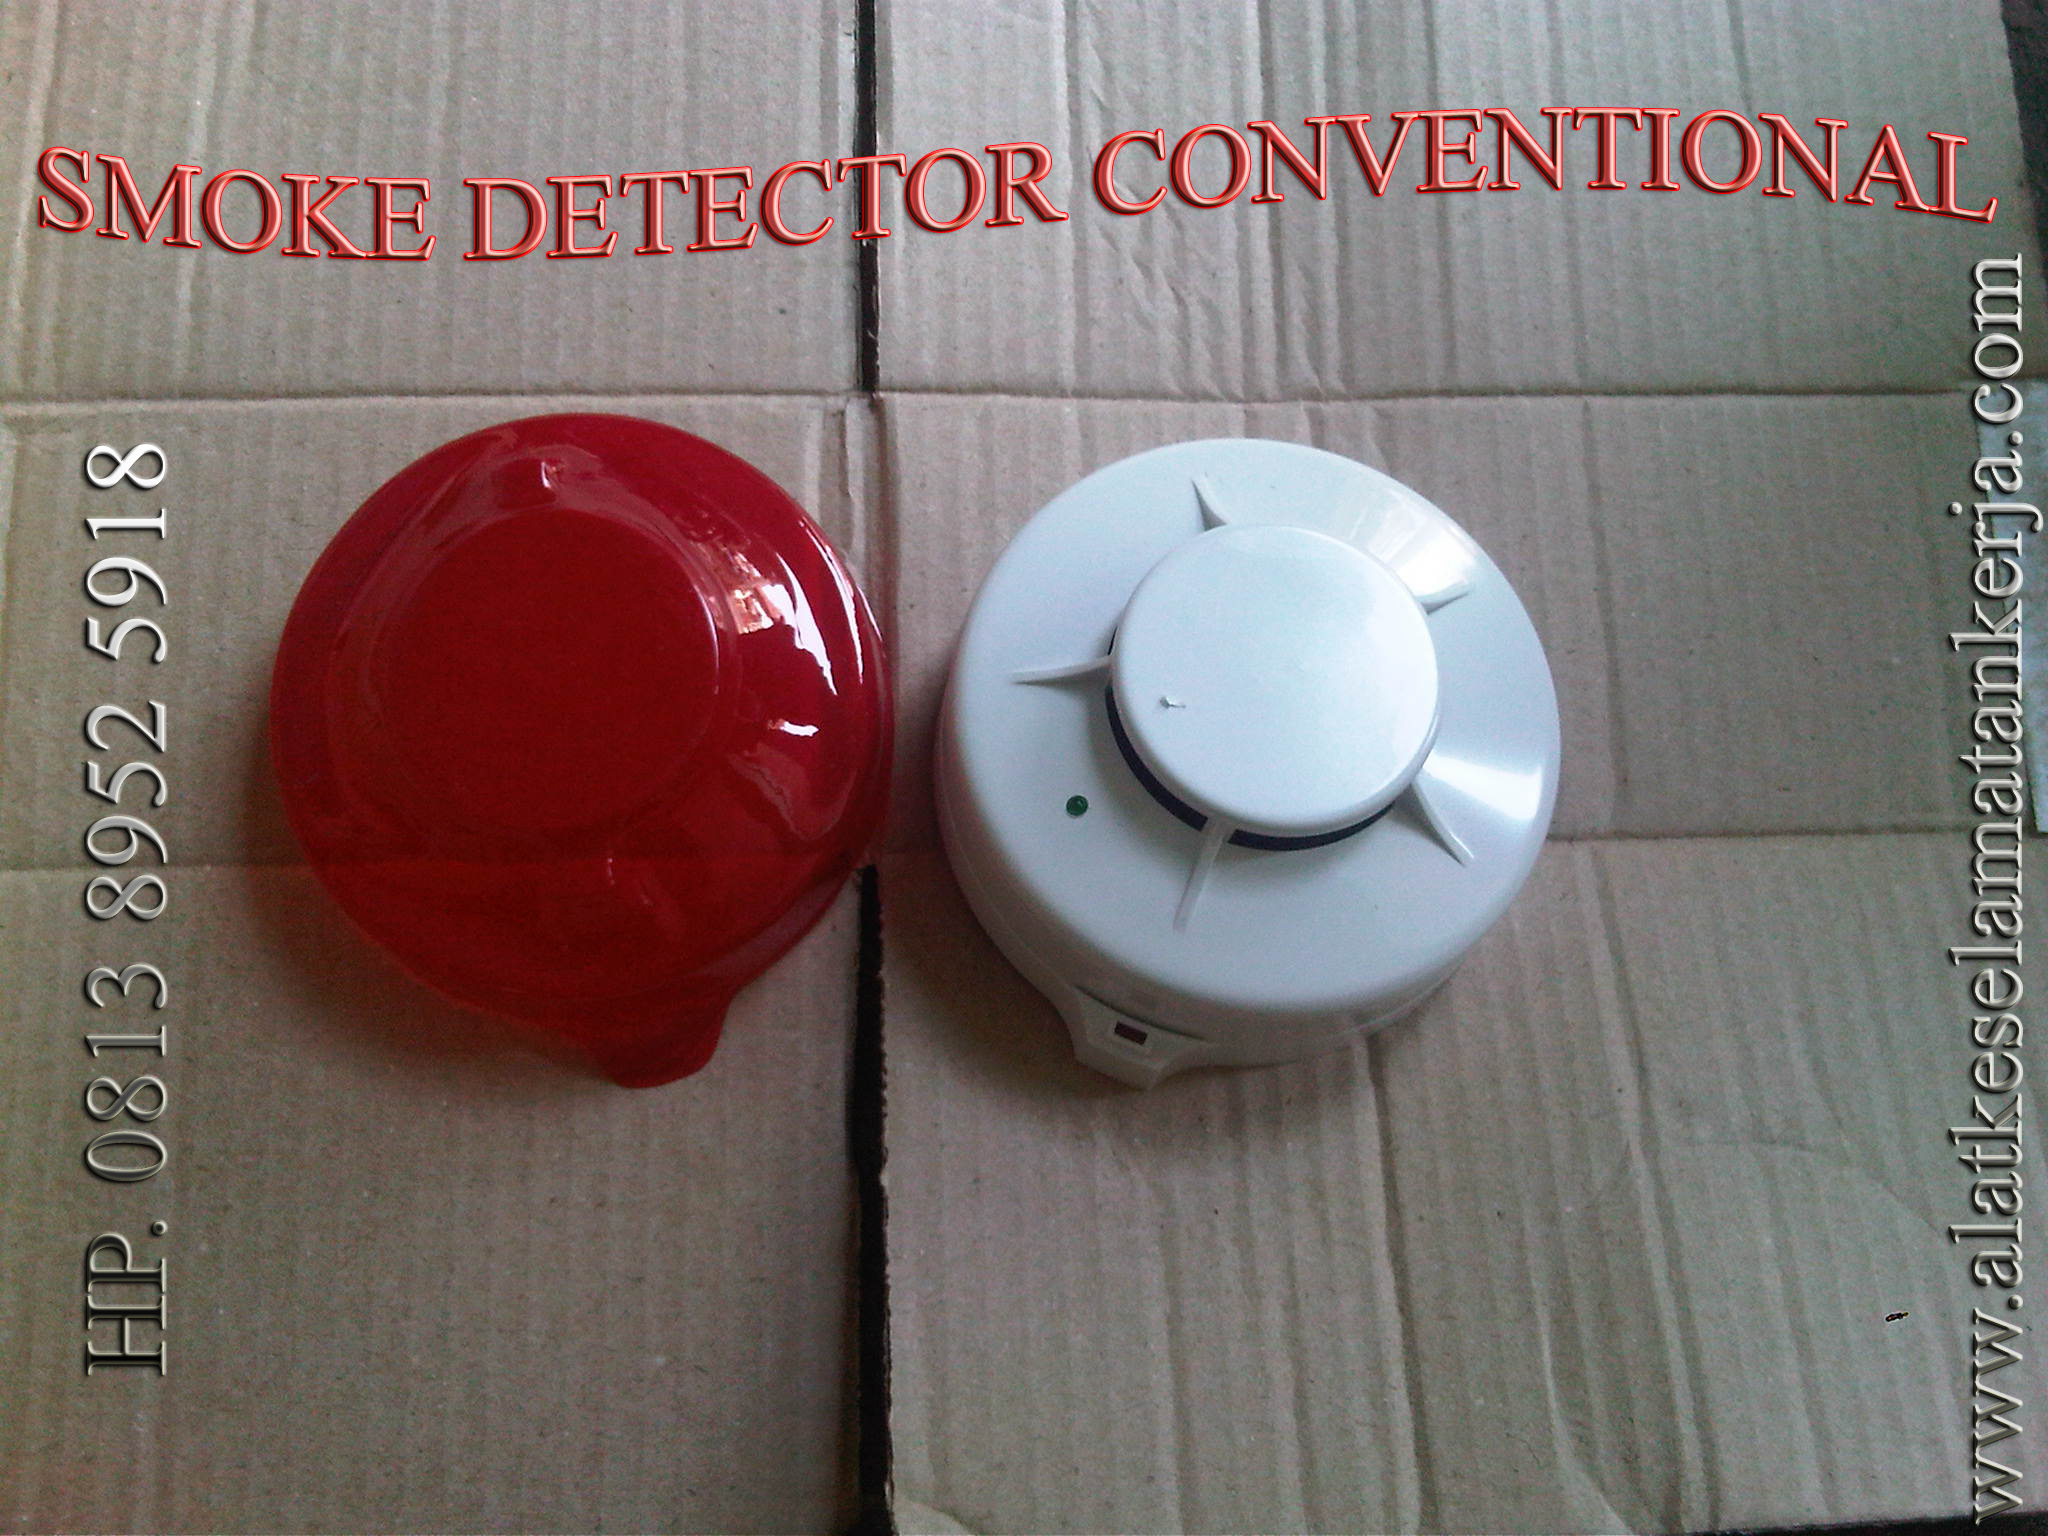 pemasangan fire alarm , belajar sistem fire alarm, fire fire lite, fire alarm bosch, pemasangan smoke detector, kilsen fire alarm, notifier nfs, fire alarm konvensional, sistem fire alarm konvensional, skematik fire alarm